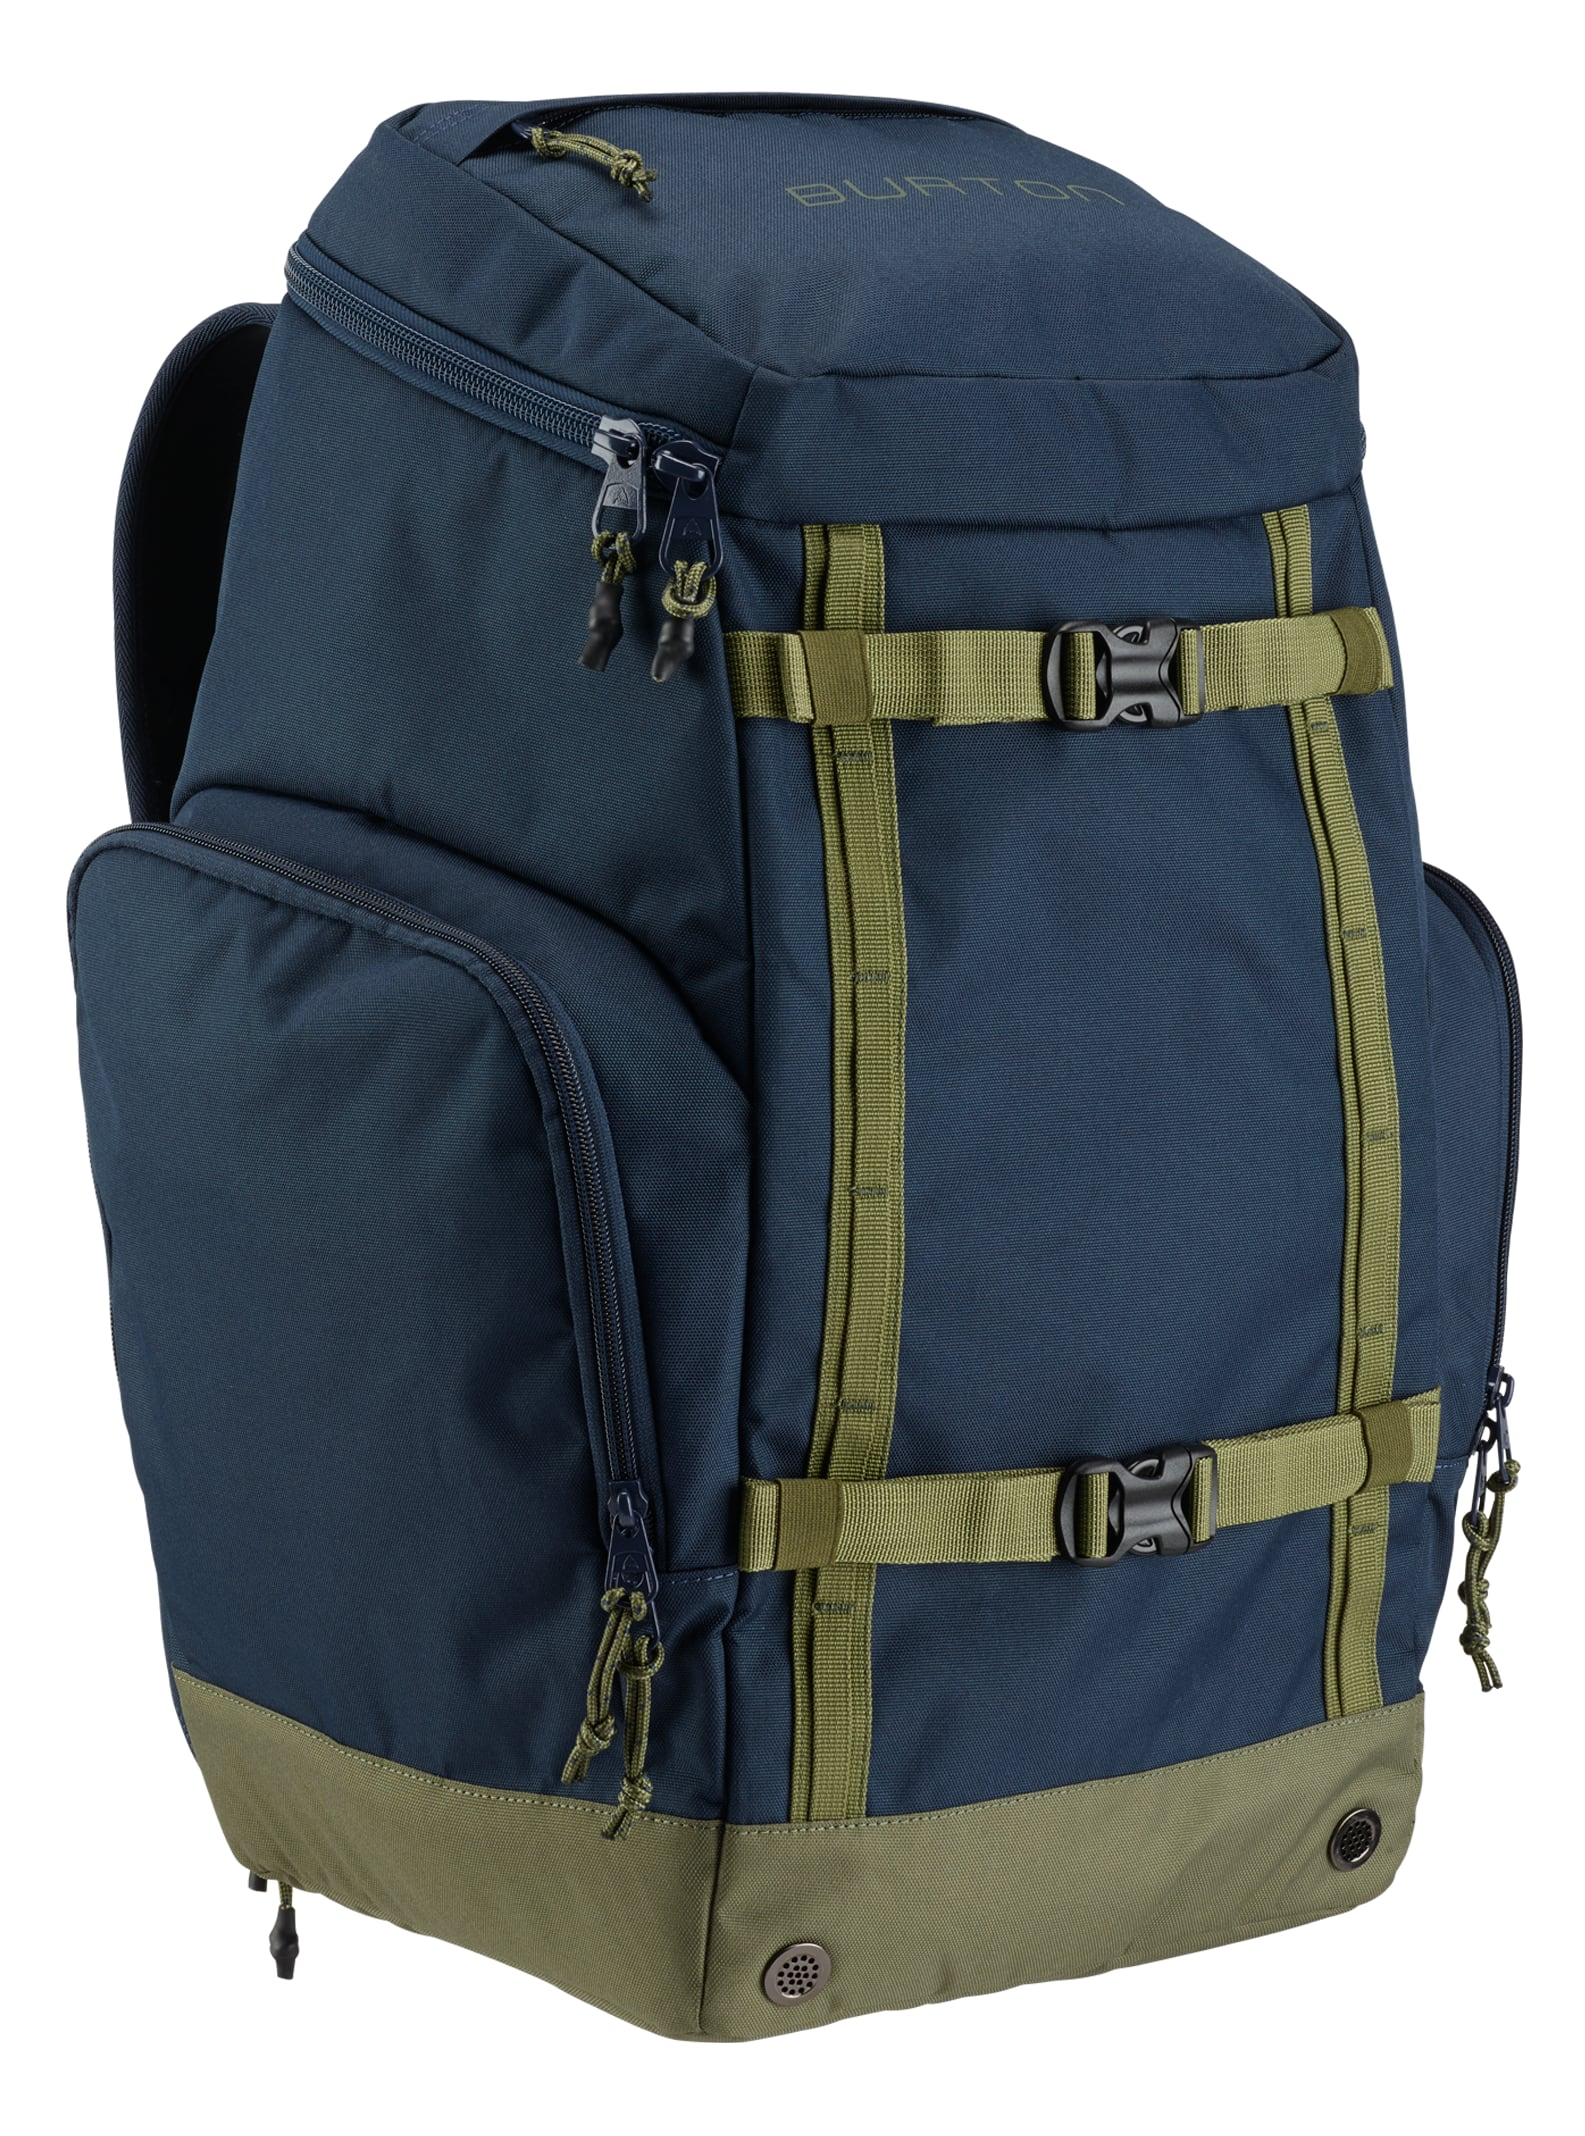 c56e5d4fea Snowboard Travel Bags